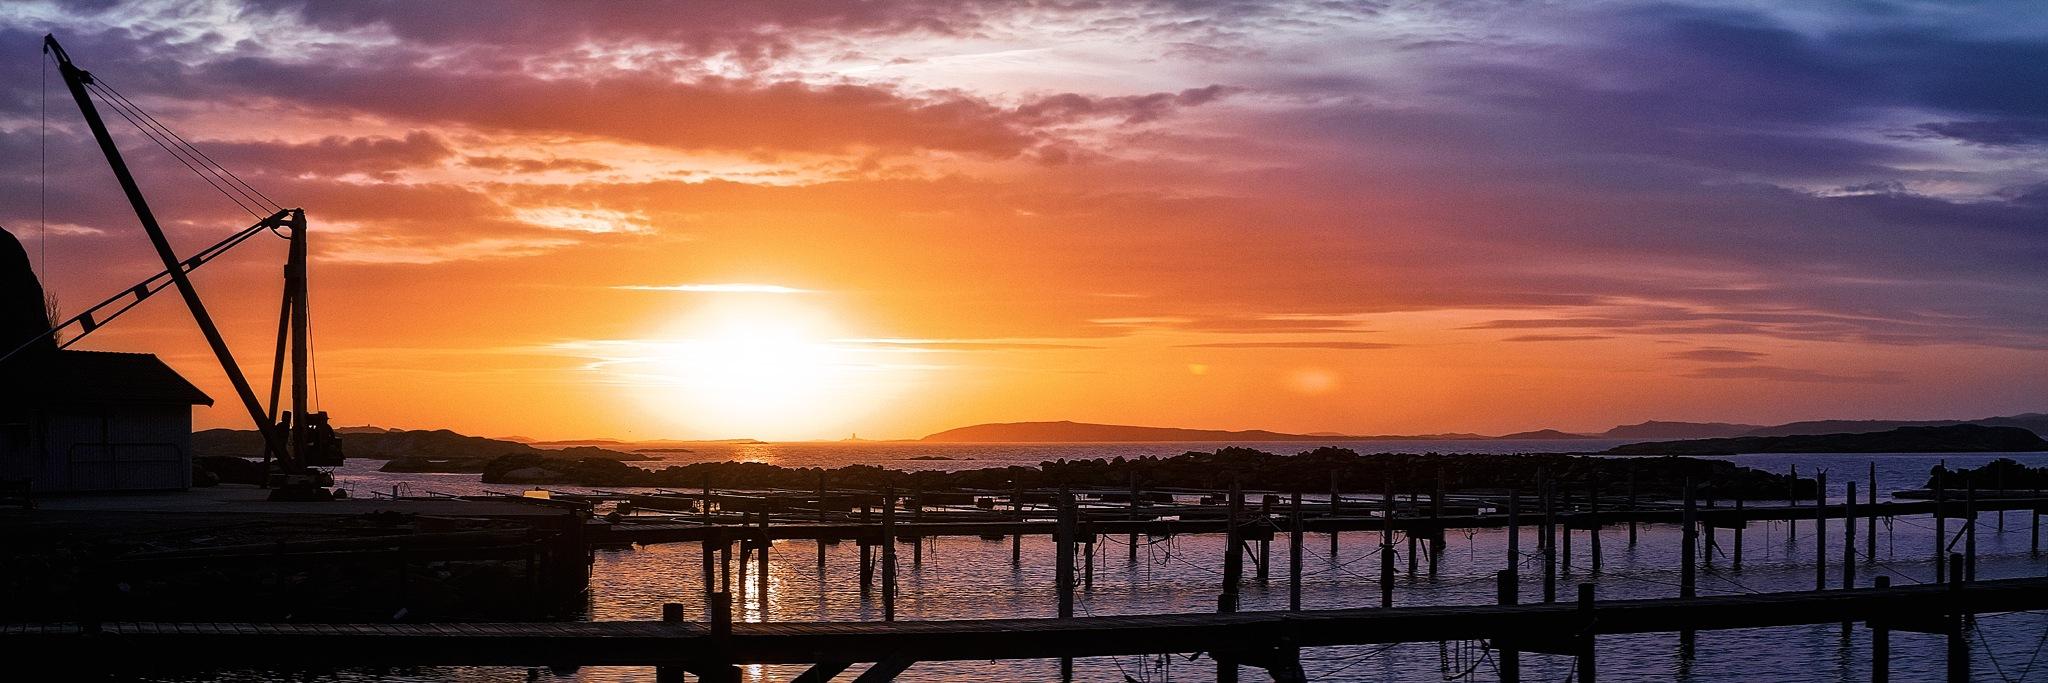 Archipelago sunset by David Eric Nilsson